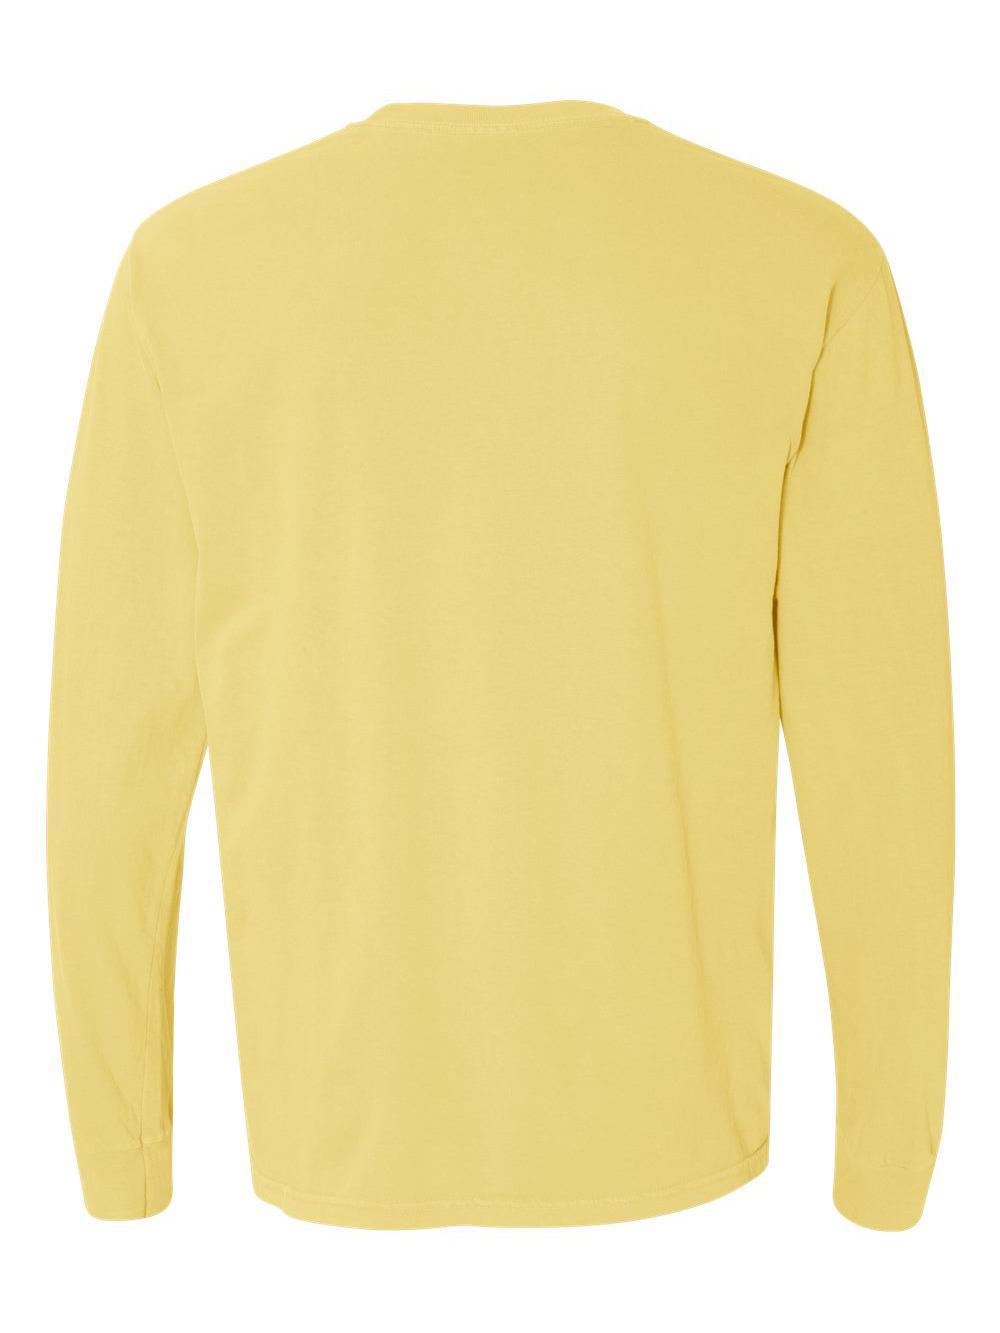 Comfort-Colors-Garment-Dyed-Heavyweight-Ringspun-Long-Sleeve-T-Shirt-6014 thumbnail 22